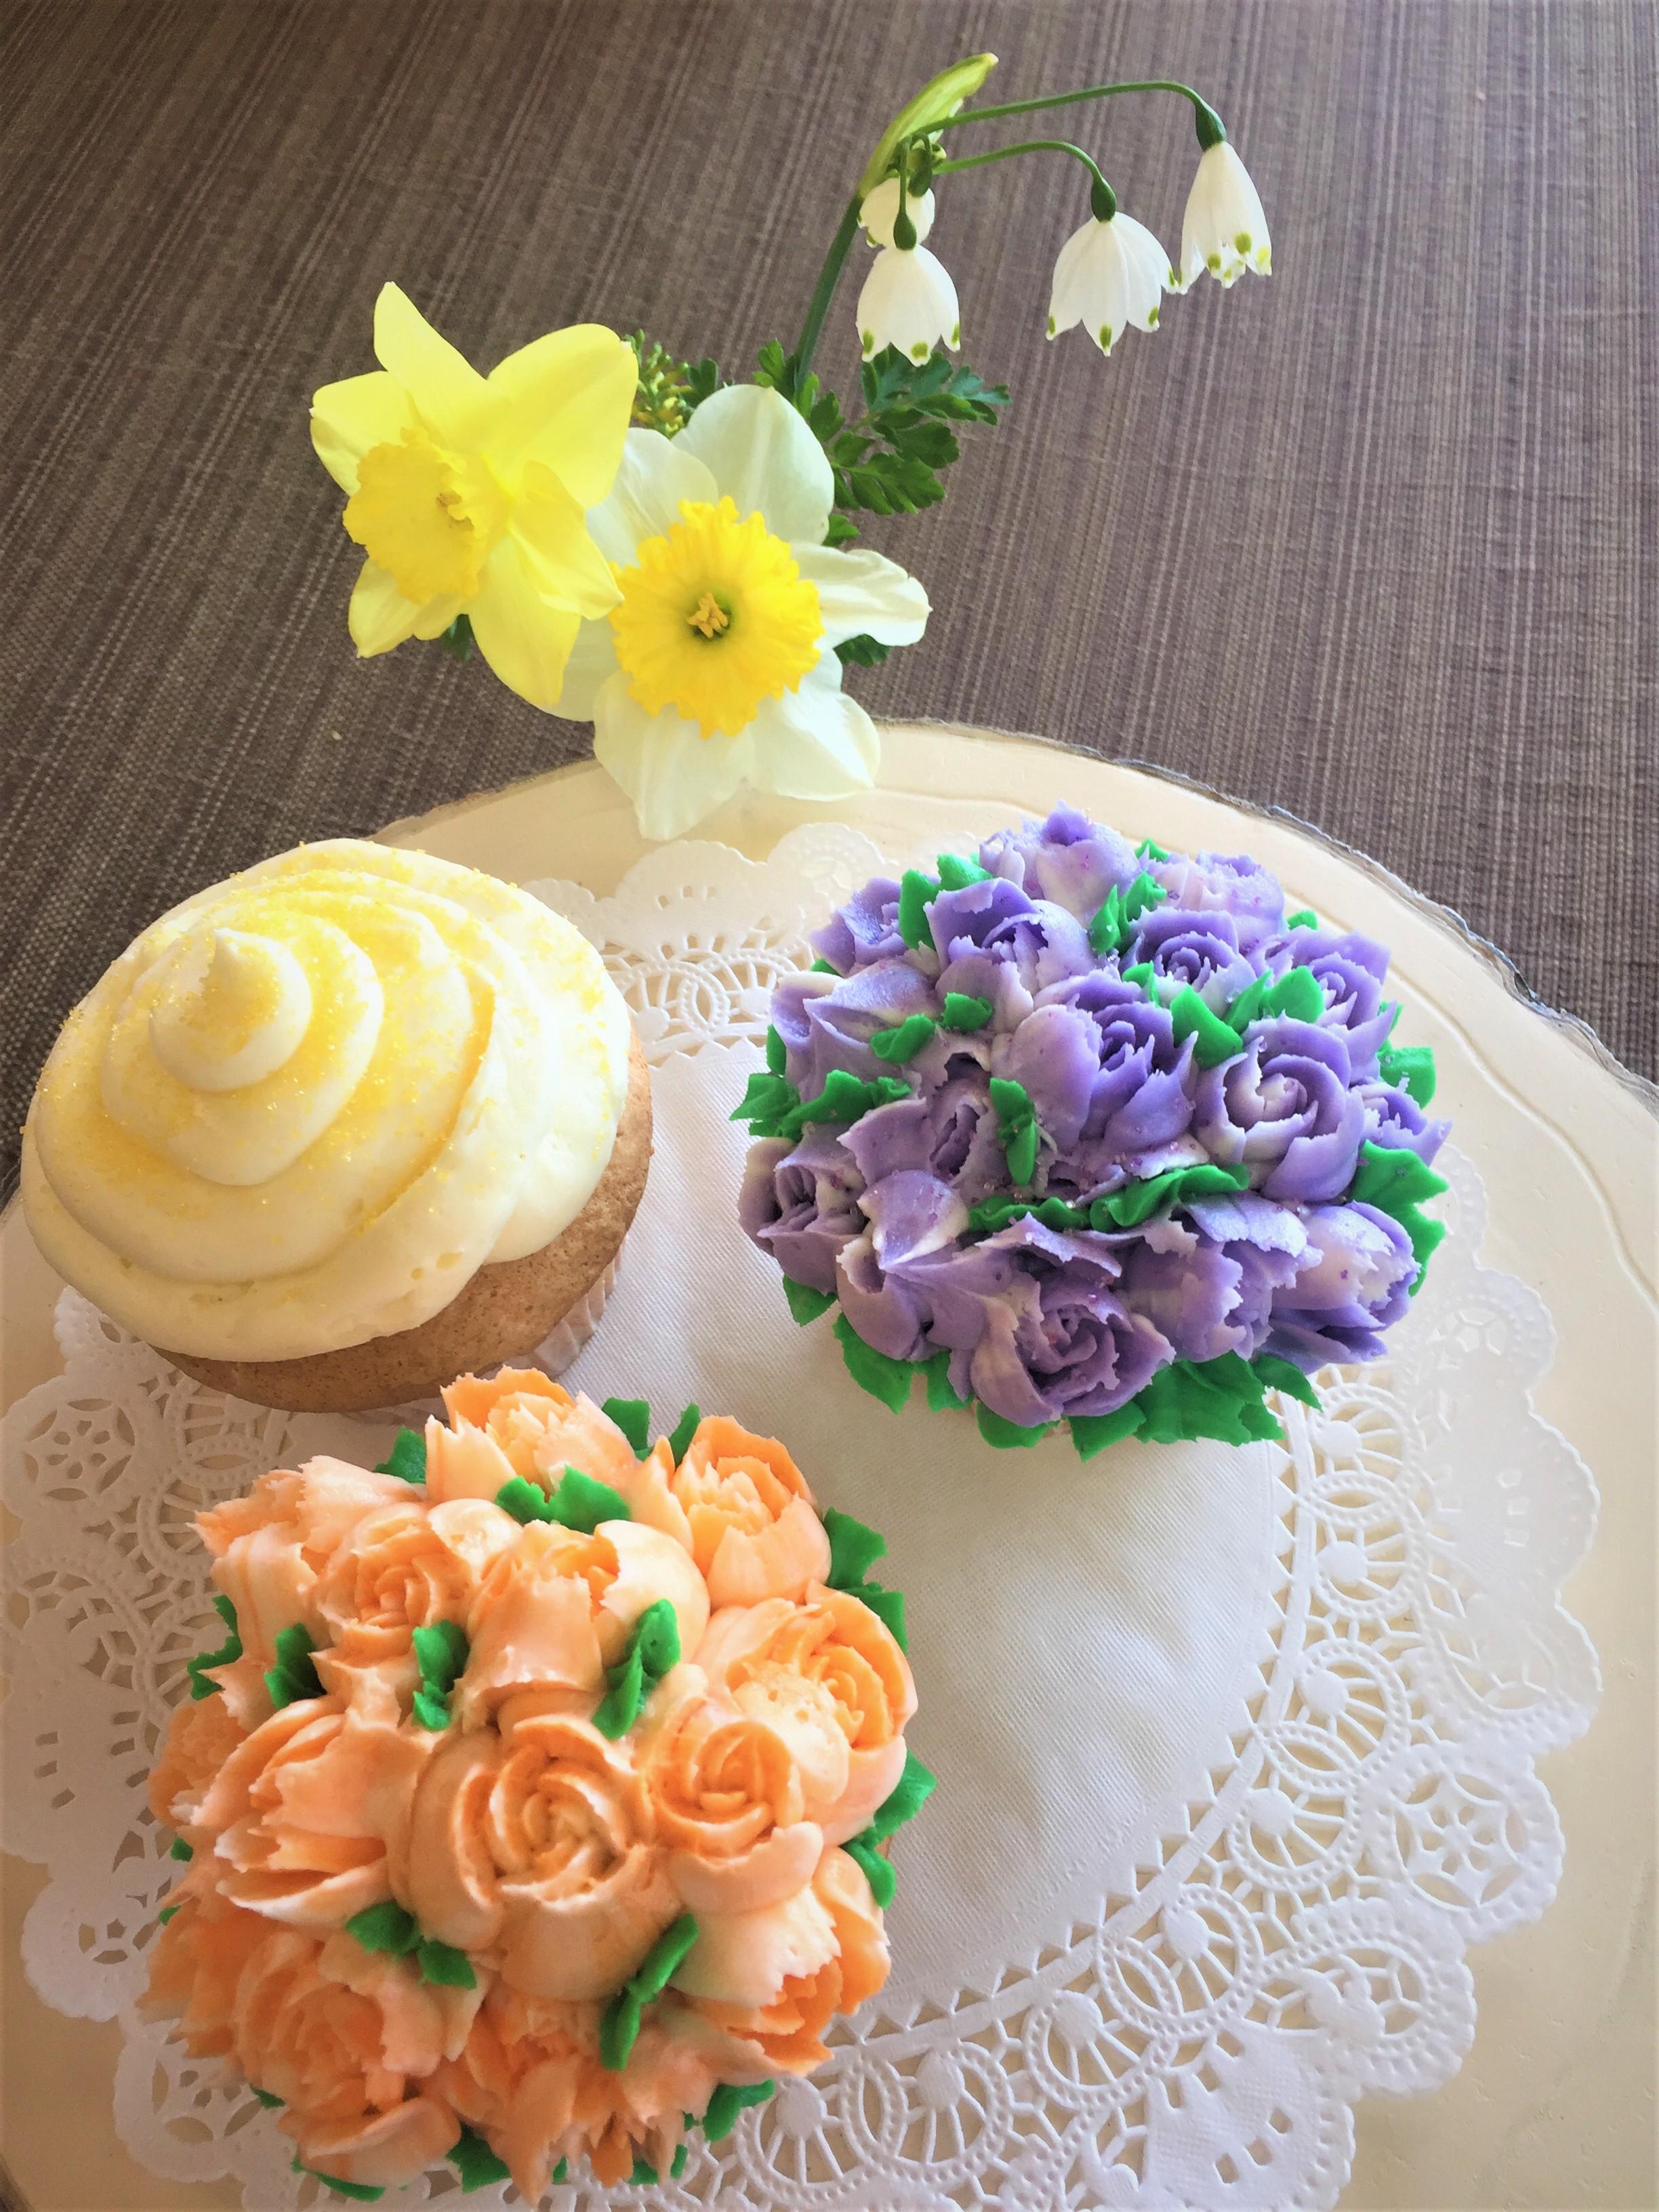 2019 Gateaux Bakery & Cafe Buttercream Flower Cupcakes.JPG